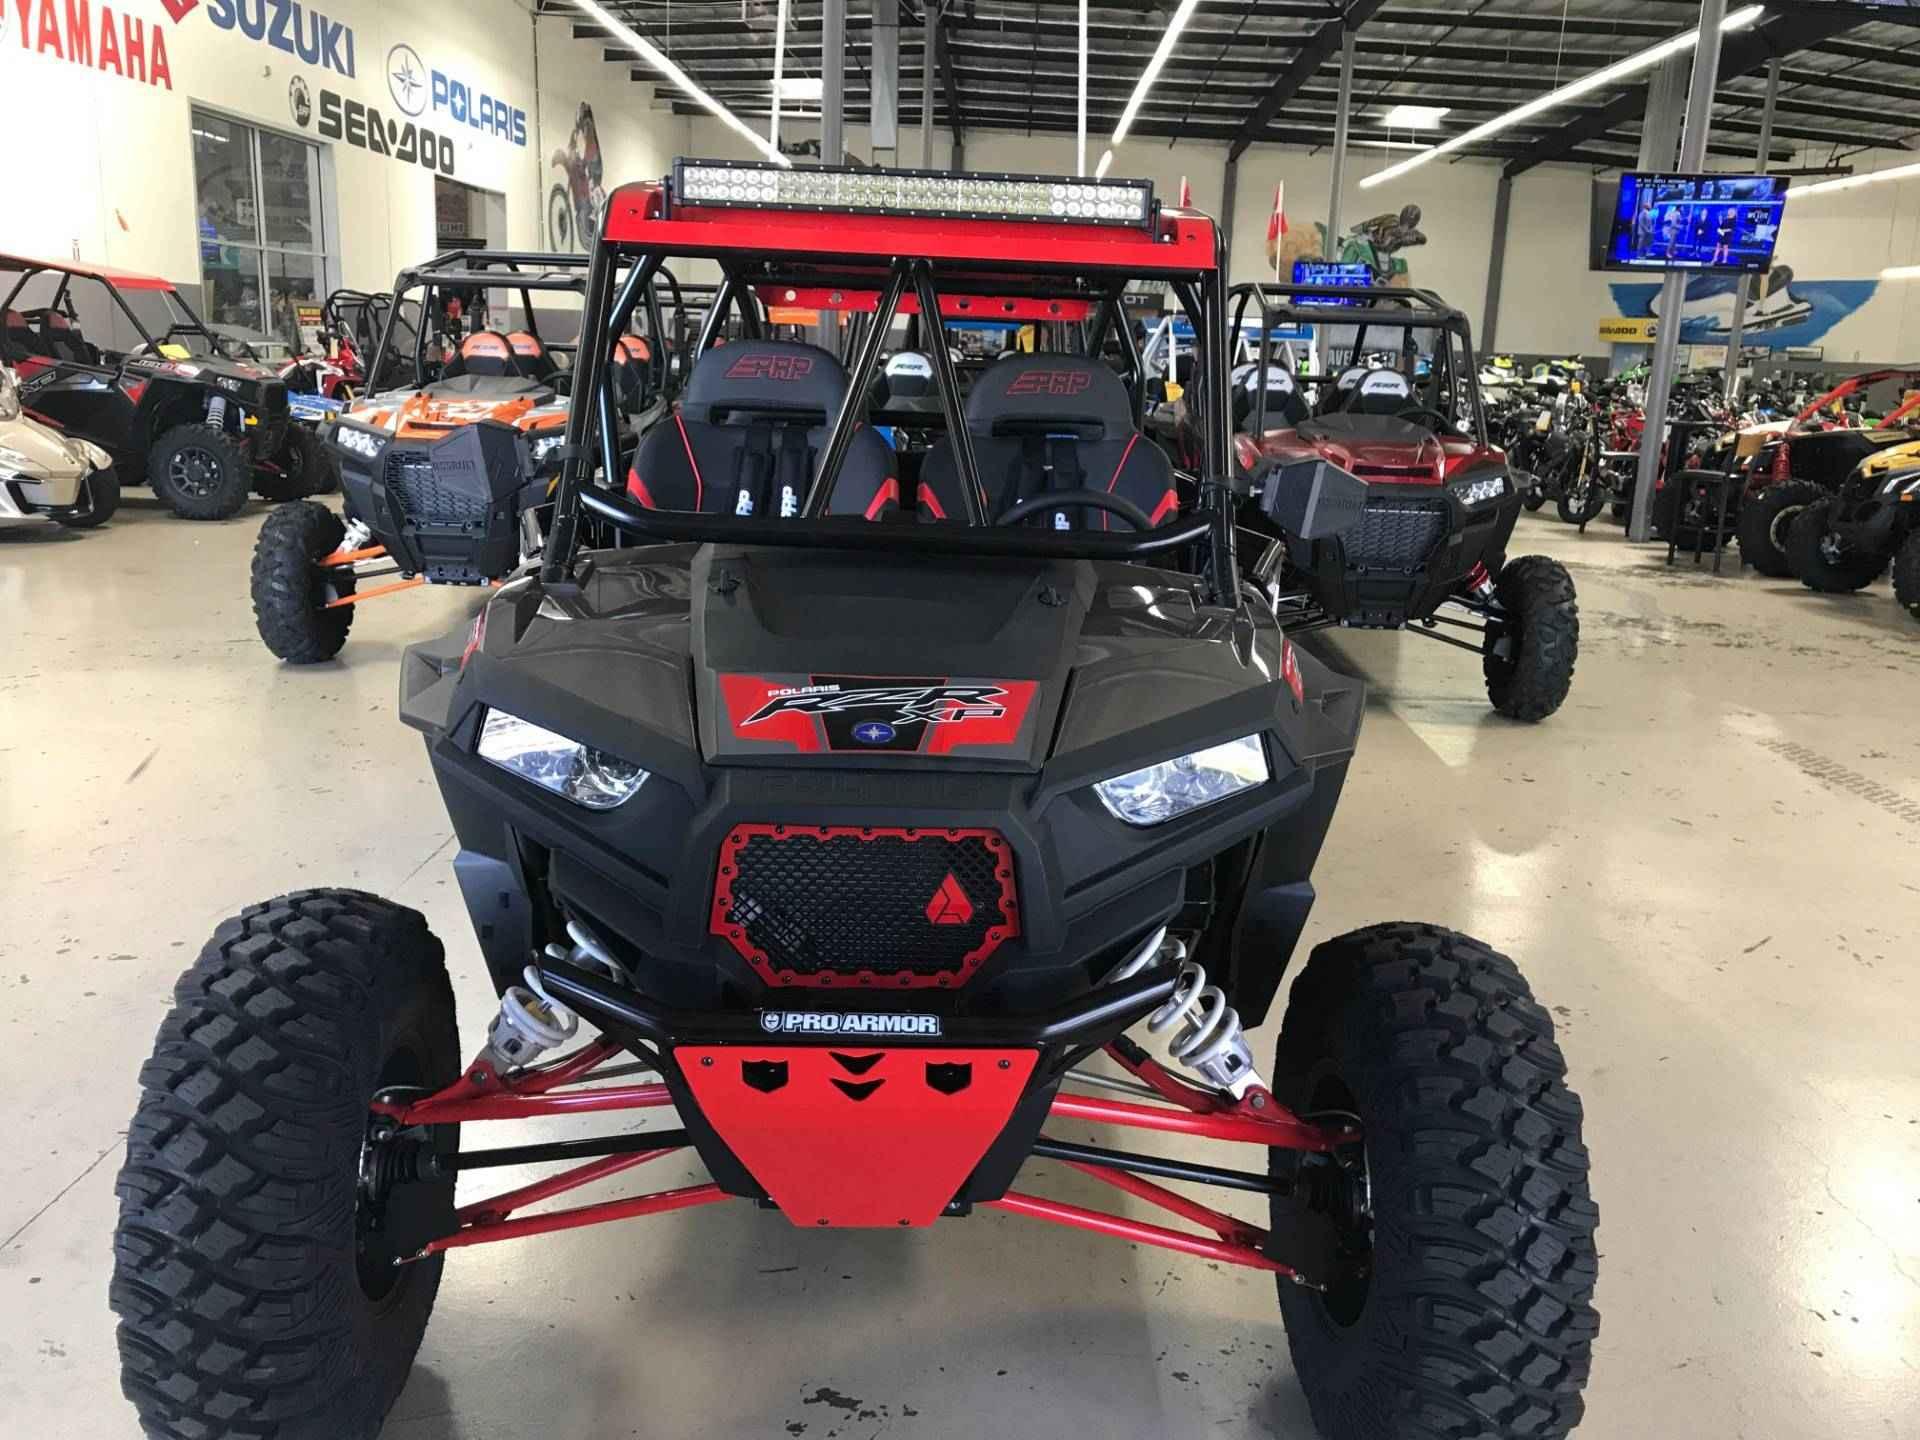 Polaris Rzr For Sale Tennessee >> New 2017 Polaris RZR XP 4 1000 EPS ATVs For Sale in California on ATV Trades